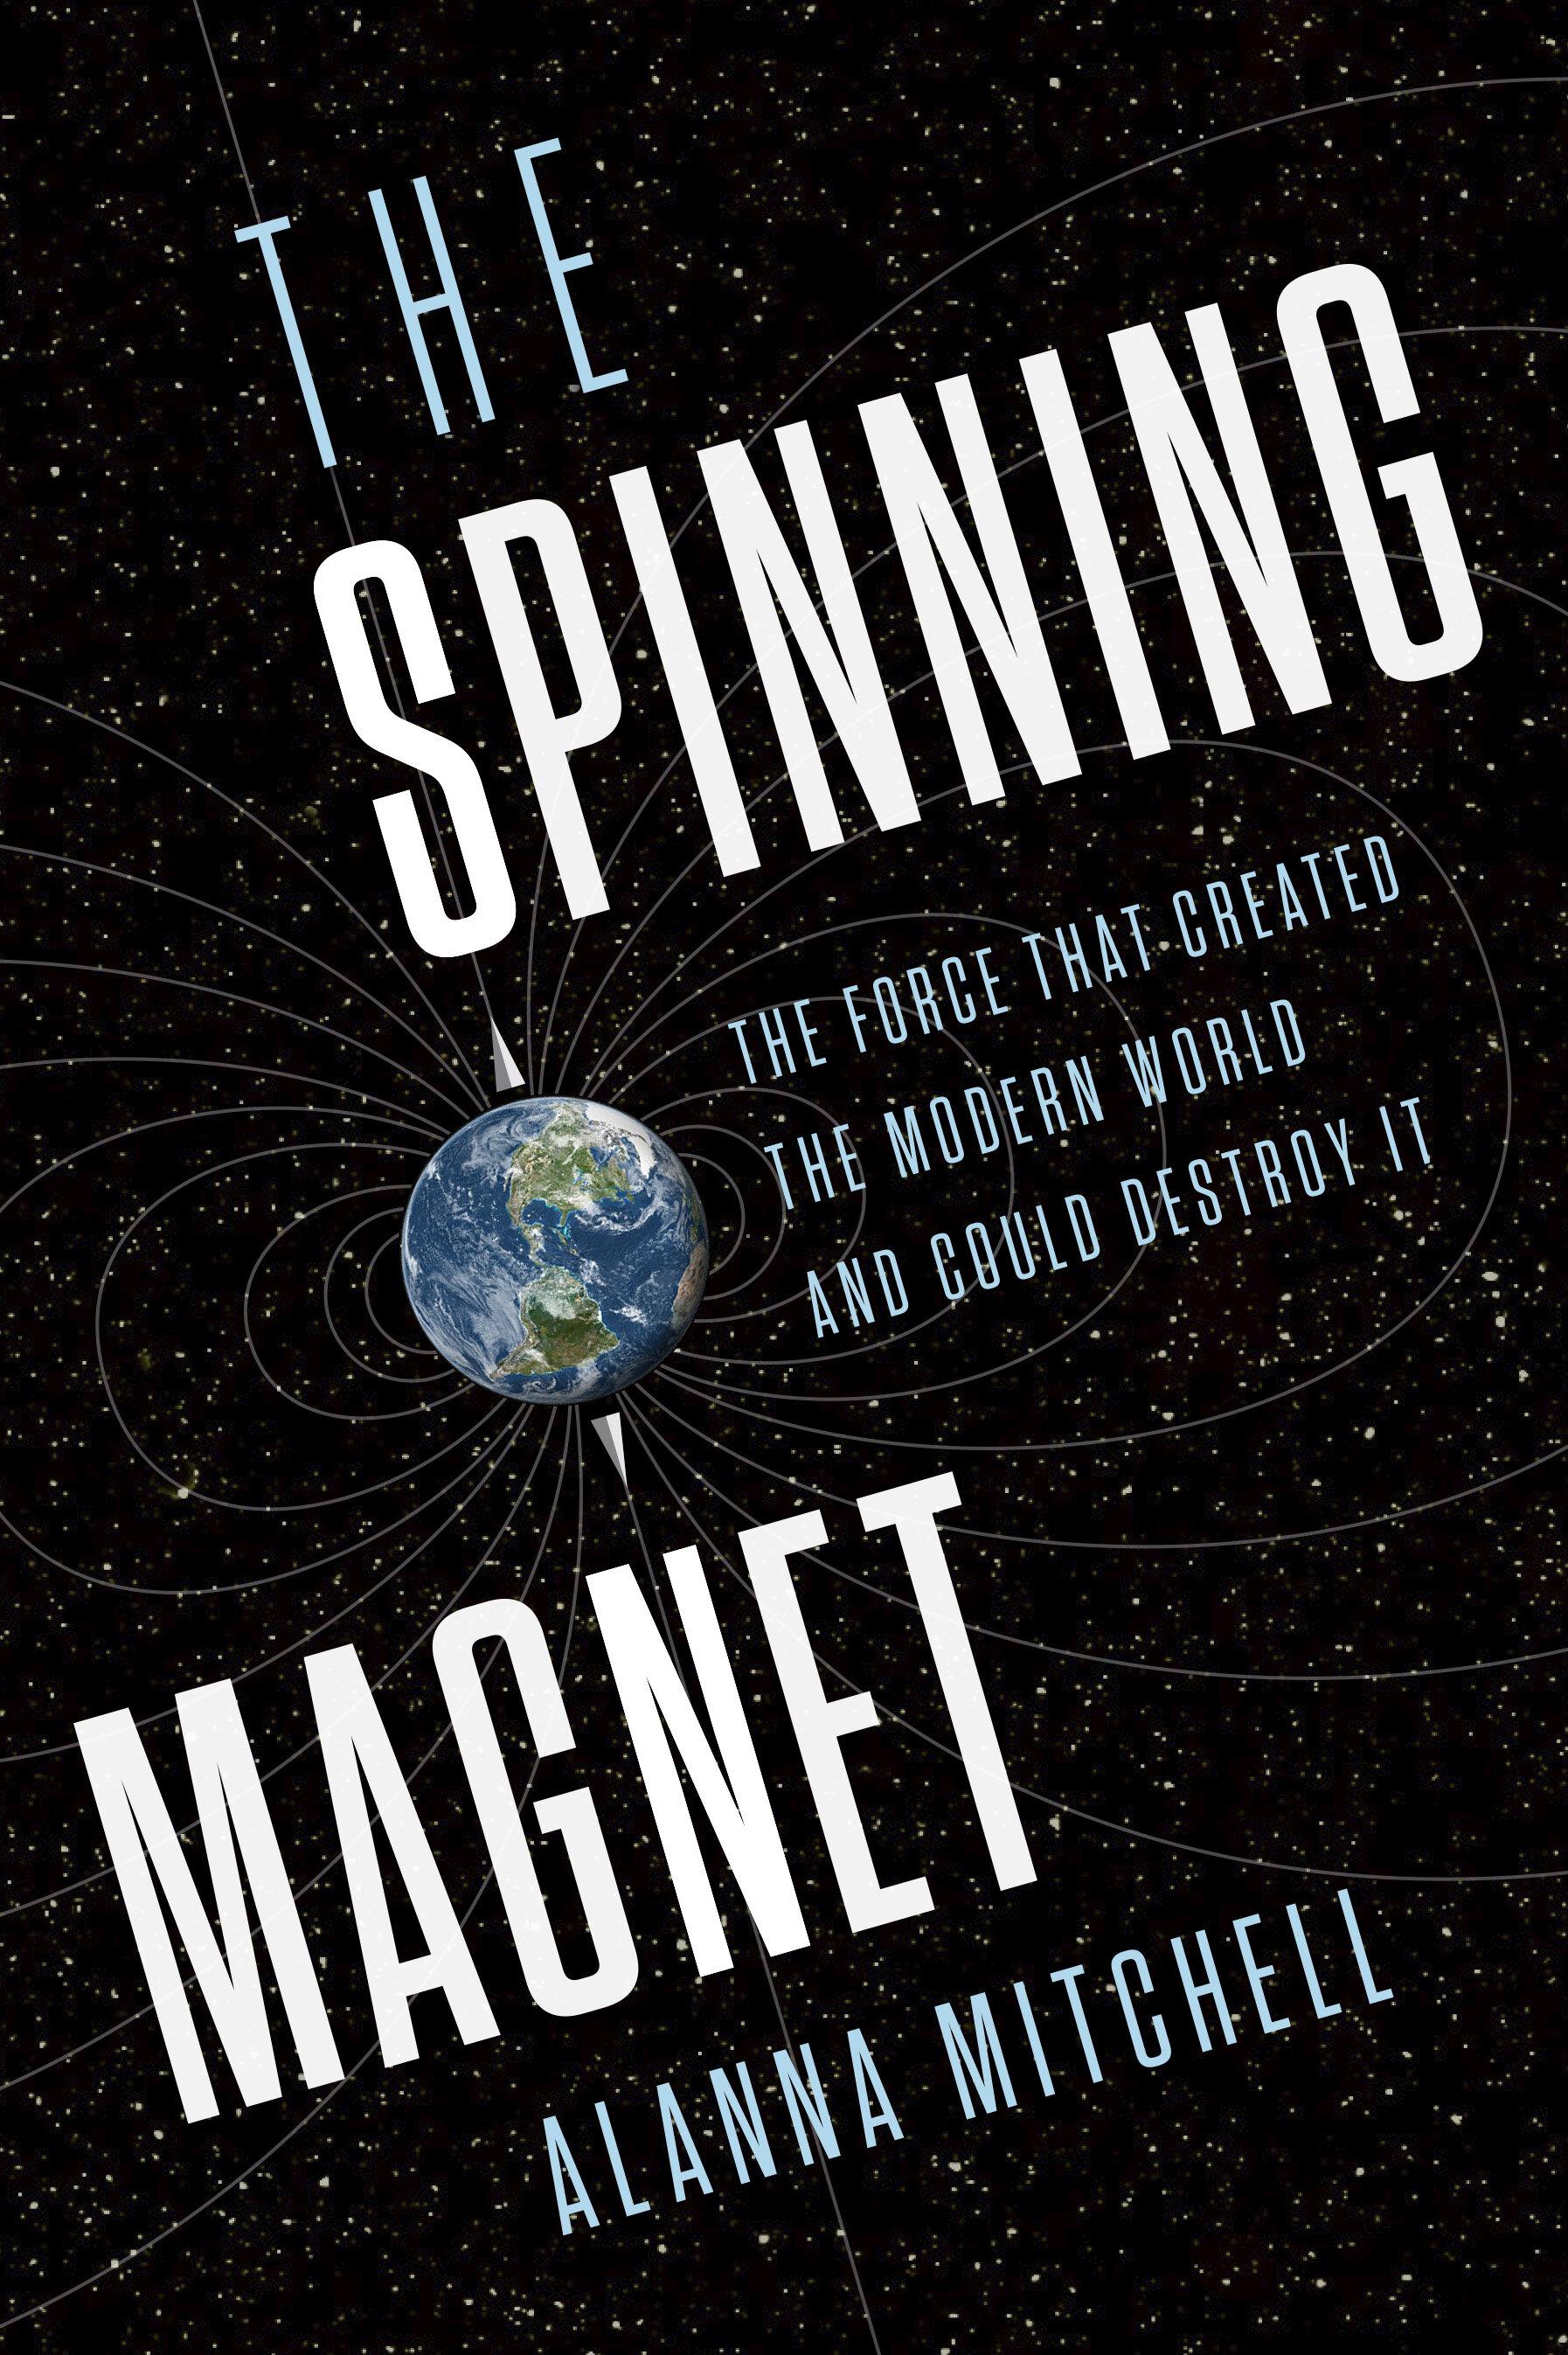 Mitchell, Alanna - The Spinning Magnet - Cda.jpg